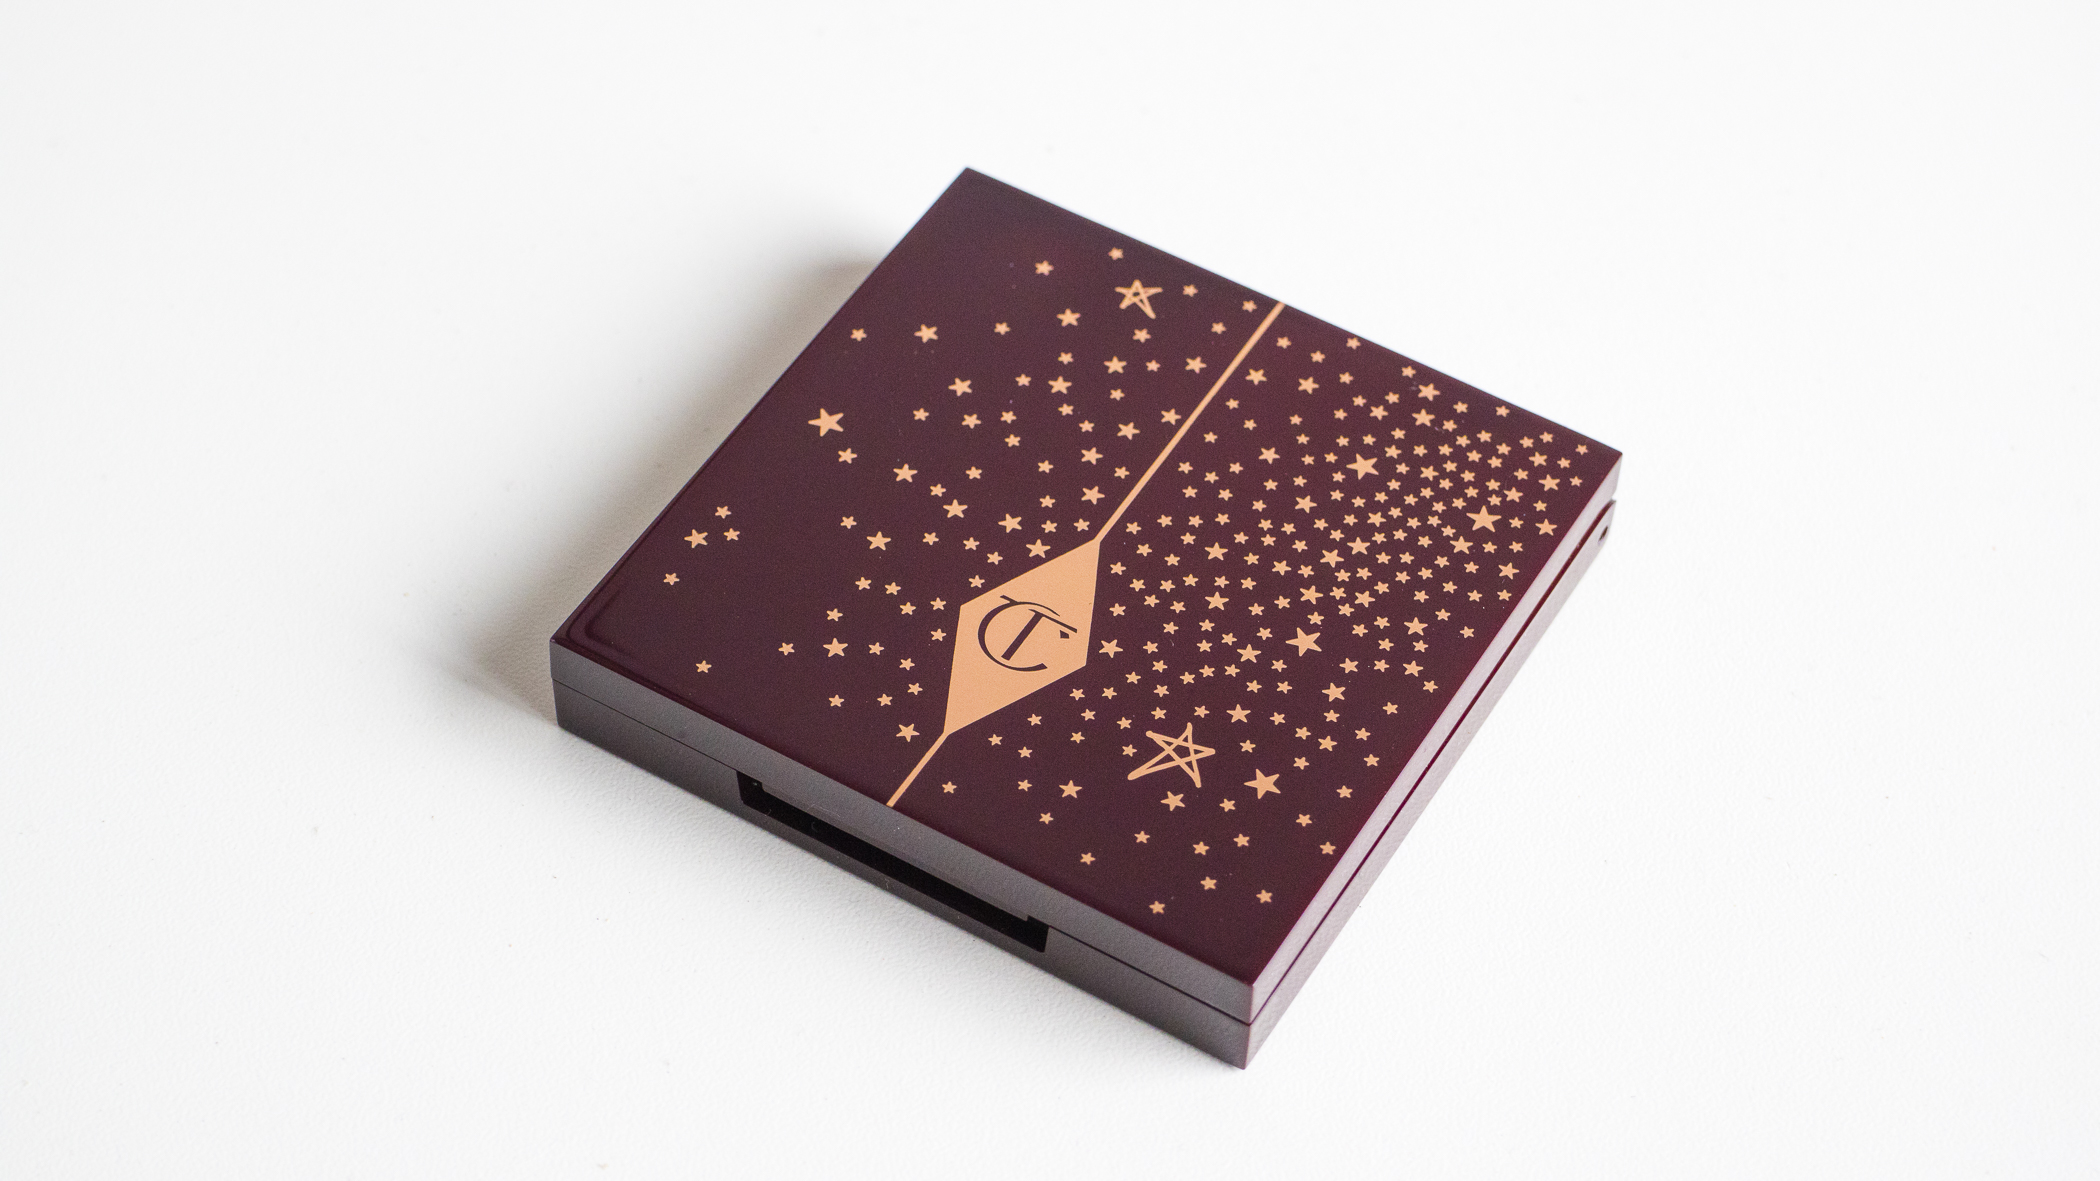 Charlotte Tilbury Limited Edition Legendary Muse Luxury Palette